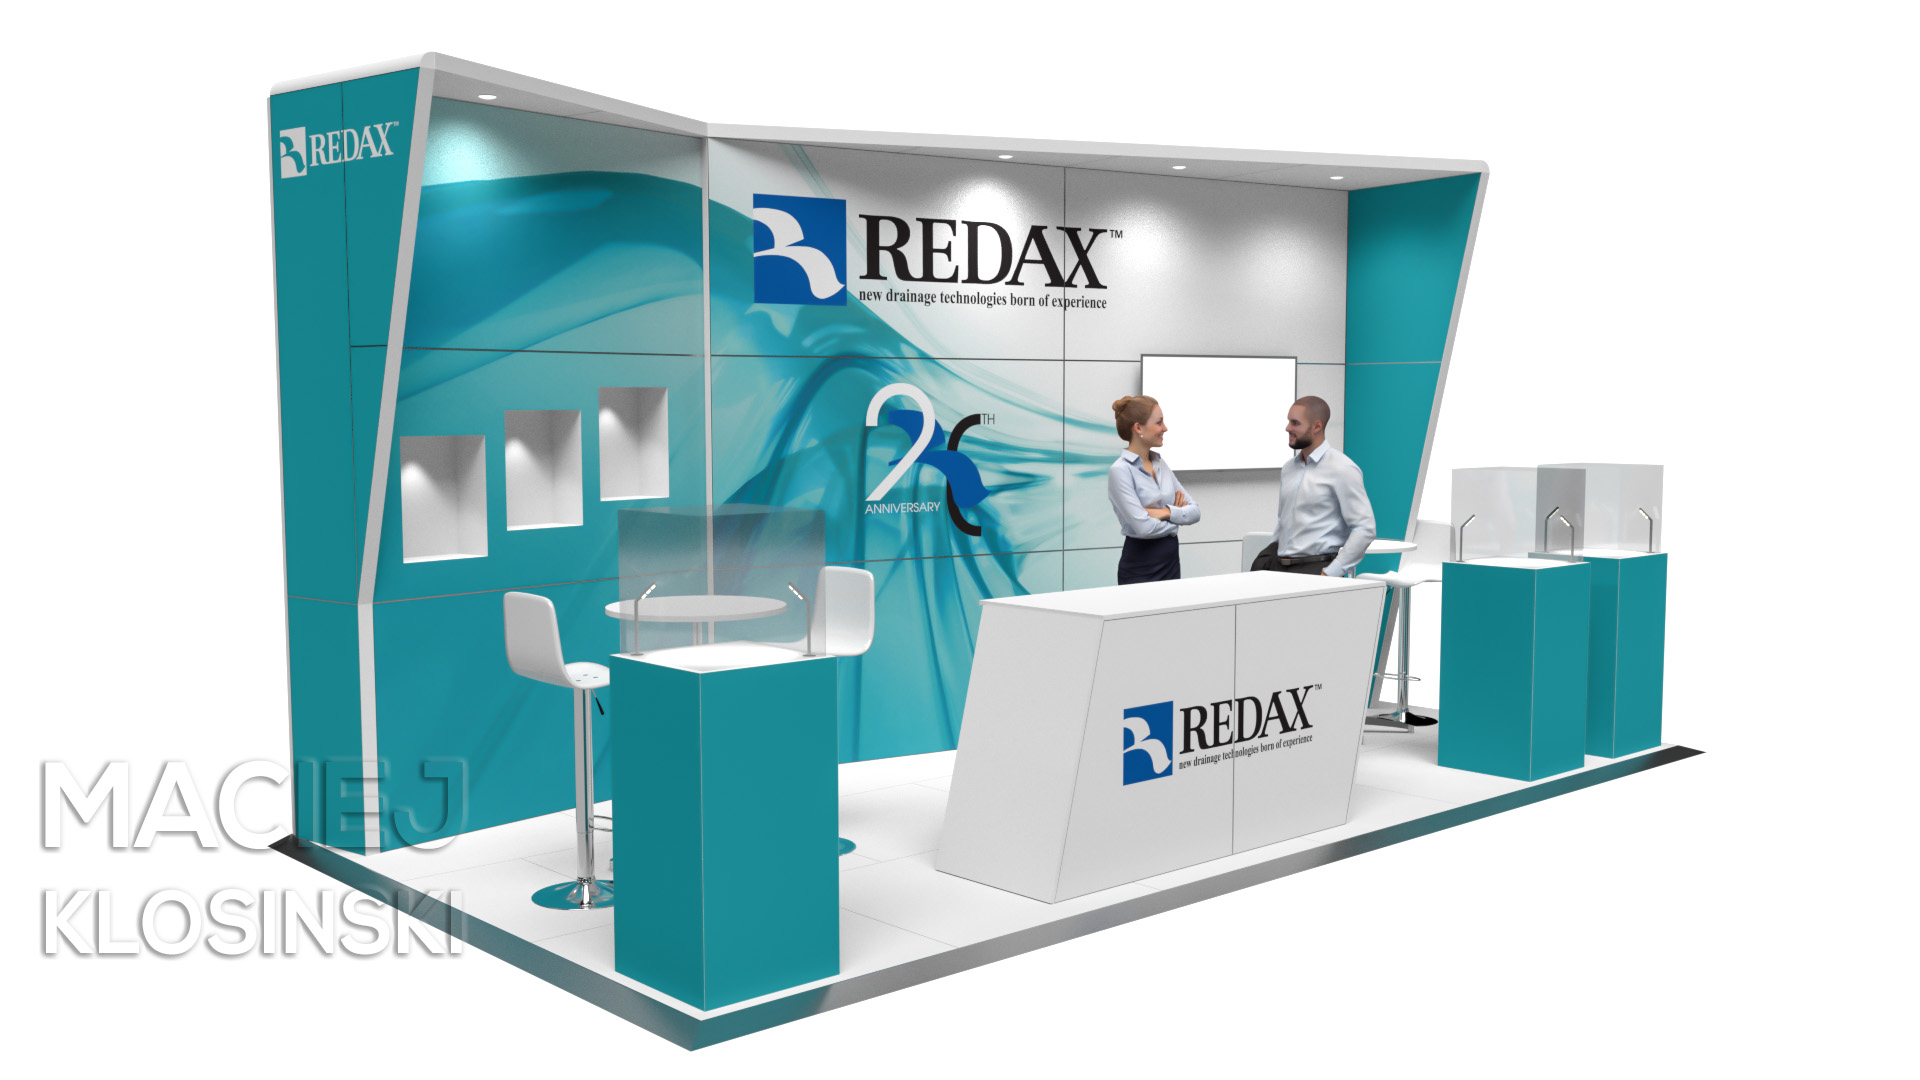 Redax at Europaediatrics 2019